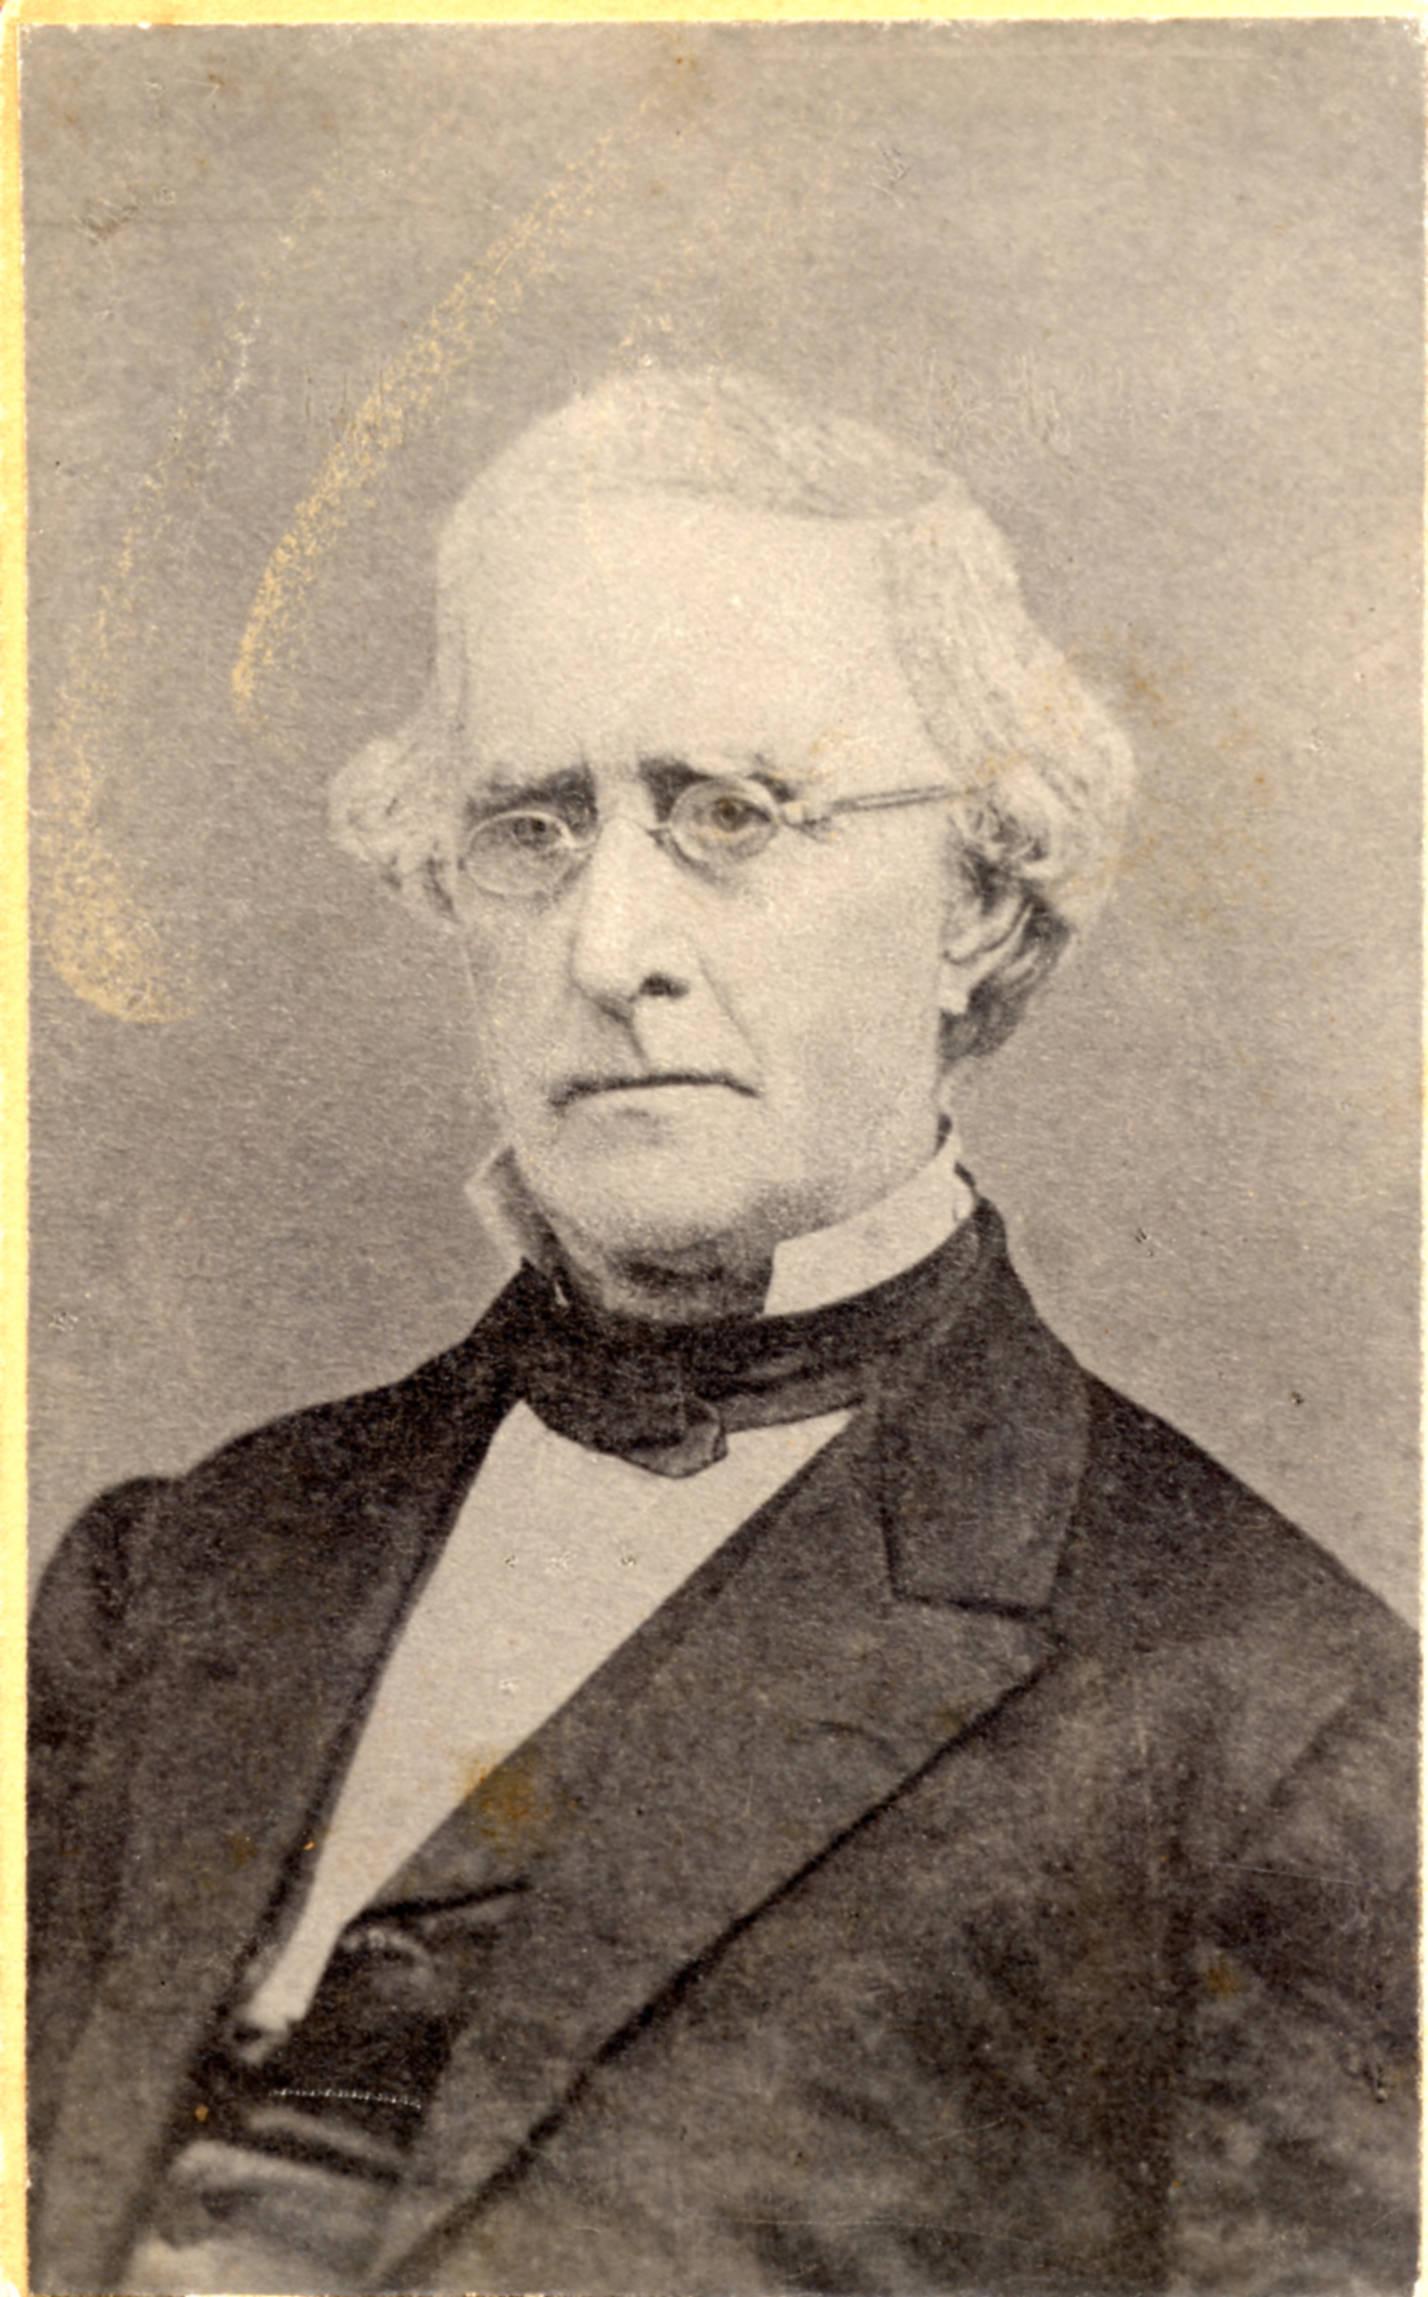 Bicknell Carleton Cole (Class of 1822) portrait